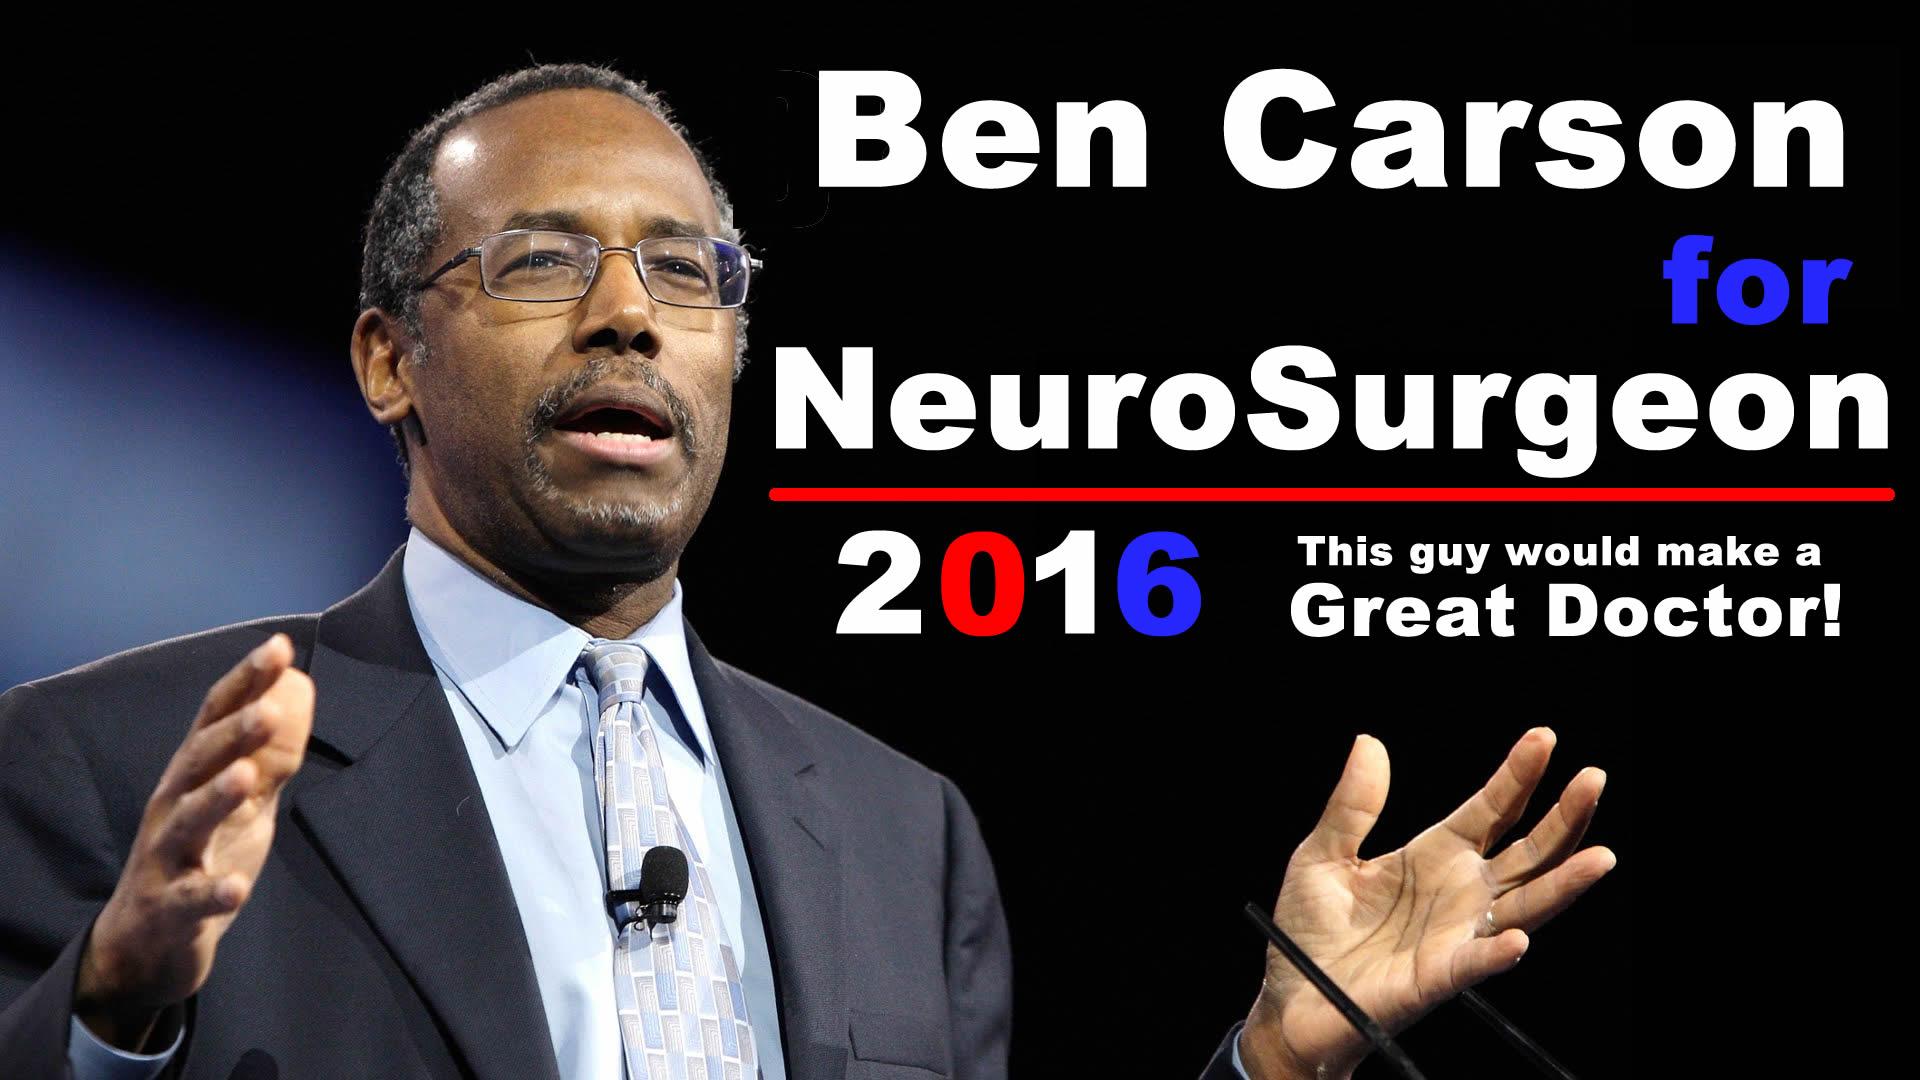 Ben-Carson-for-Neurosurgeon